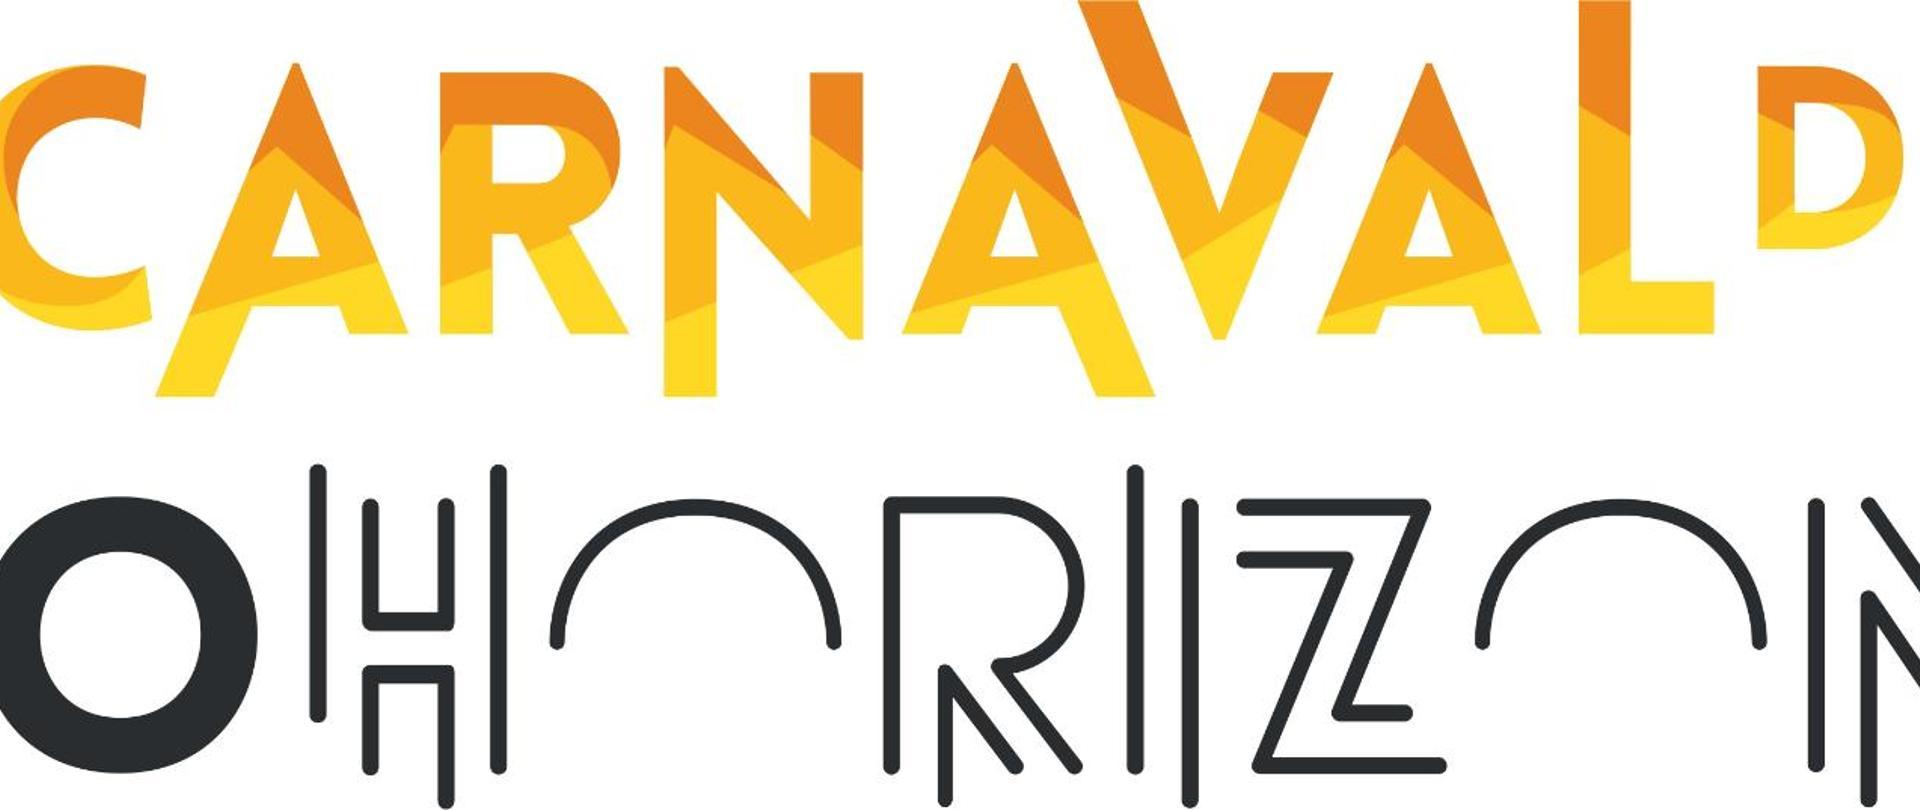 logo carnaval18_amarelo.jpg